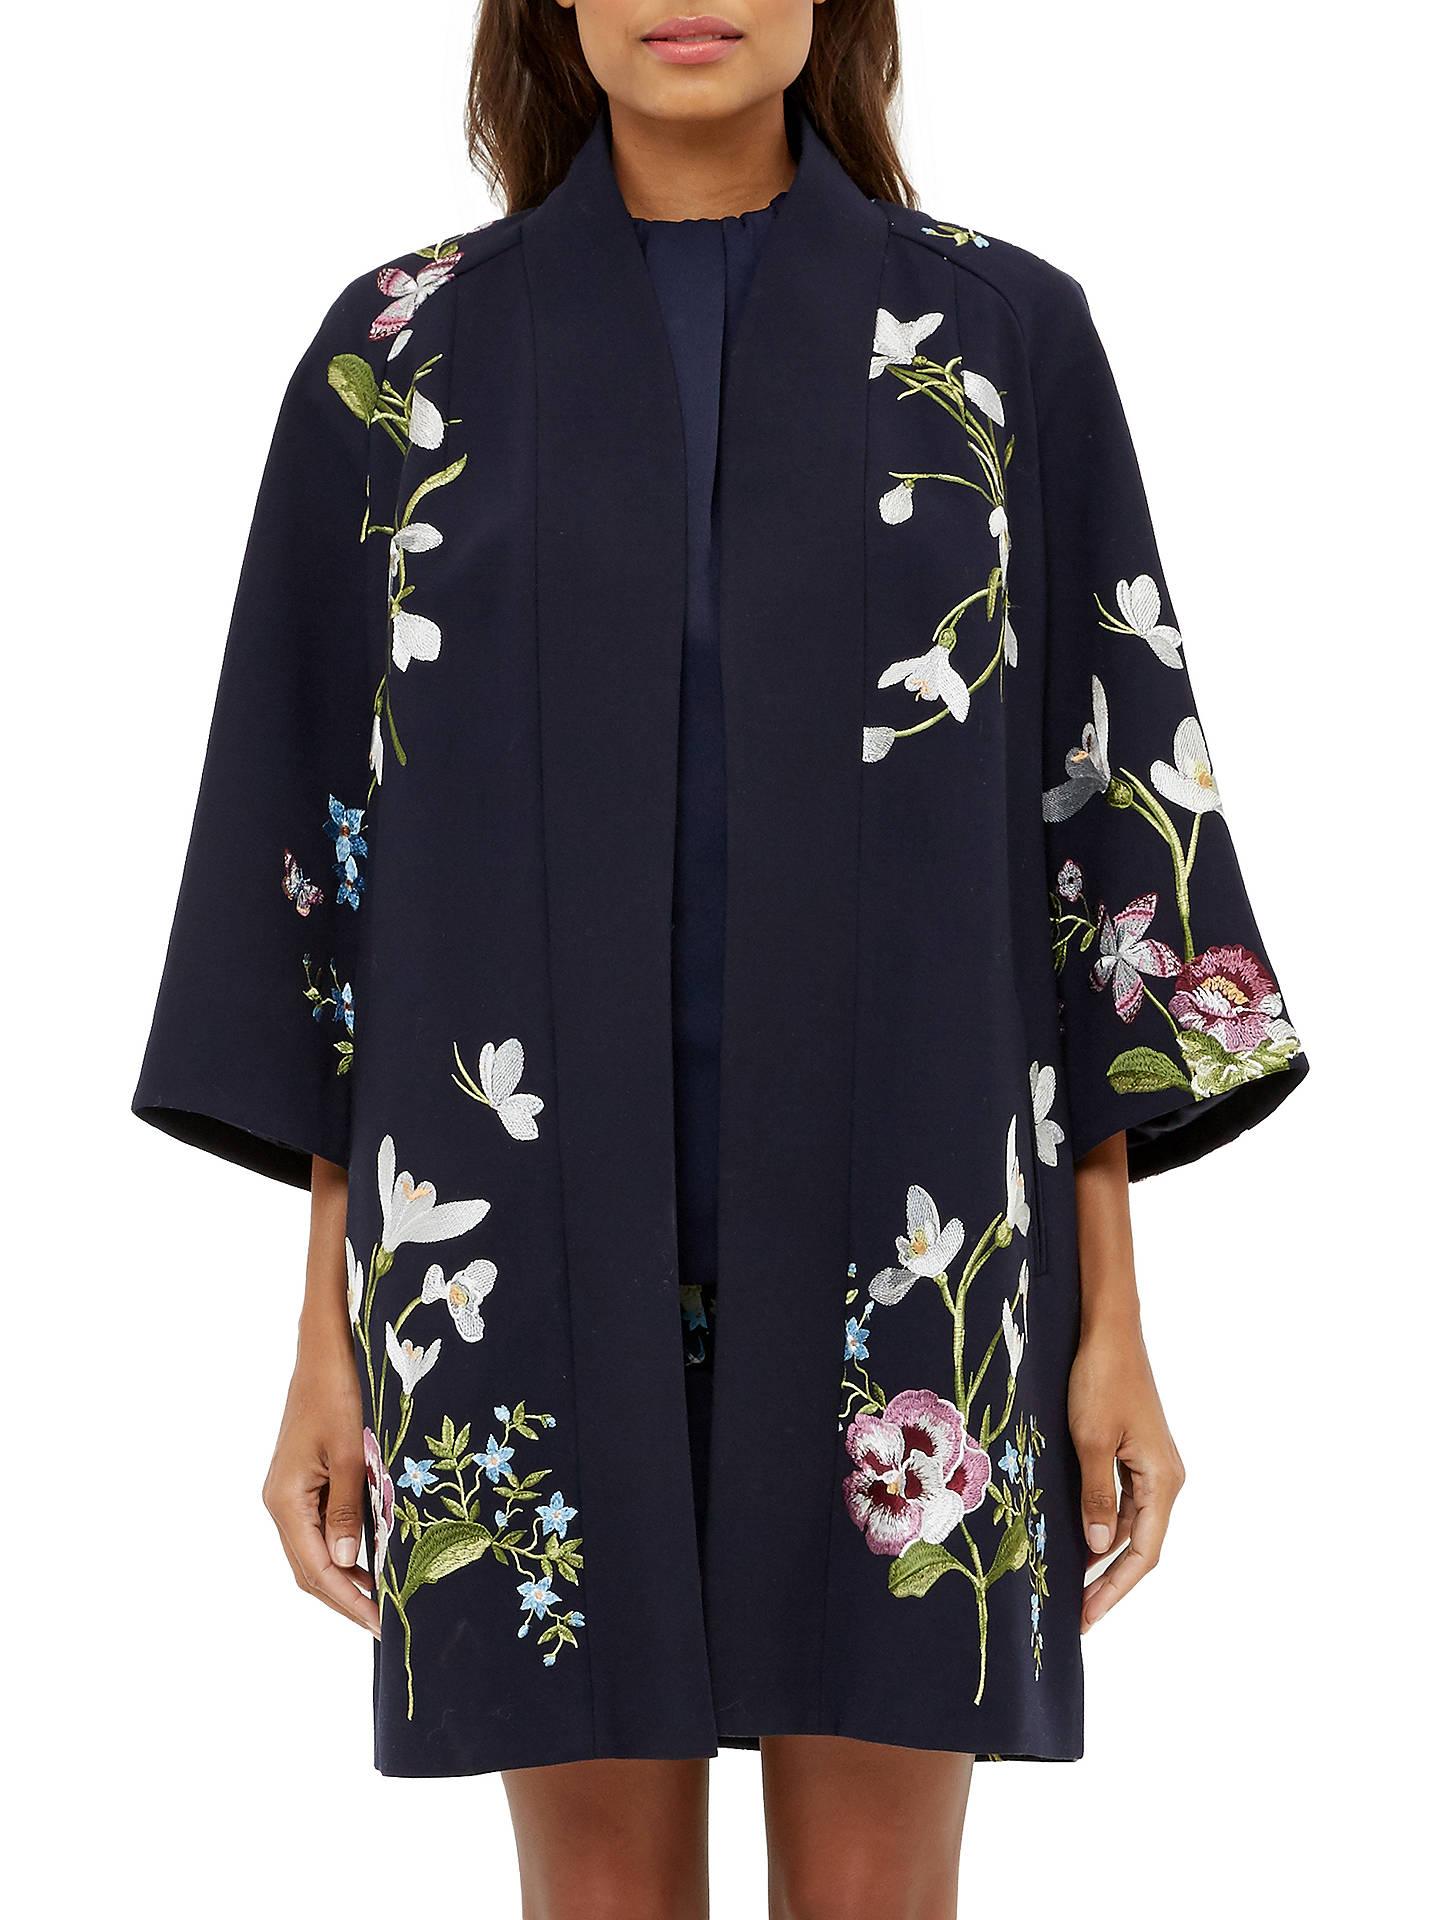 8cd3a6062 Ted Baker Denuka Spring Meadow Kimono Jacket, Dark Blue at John ...